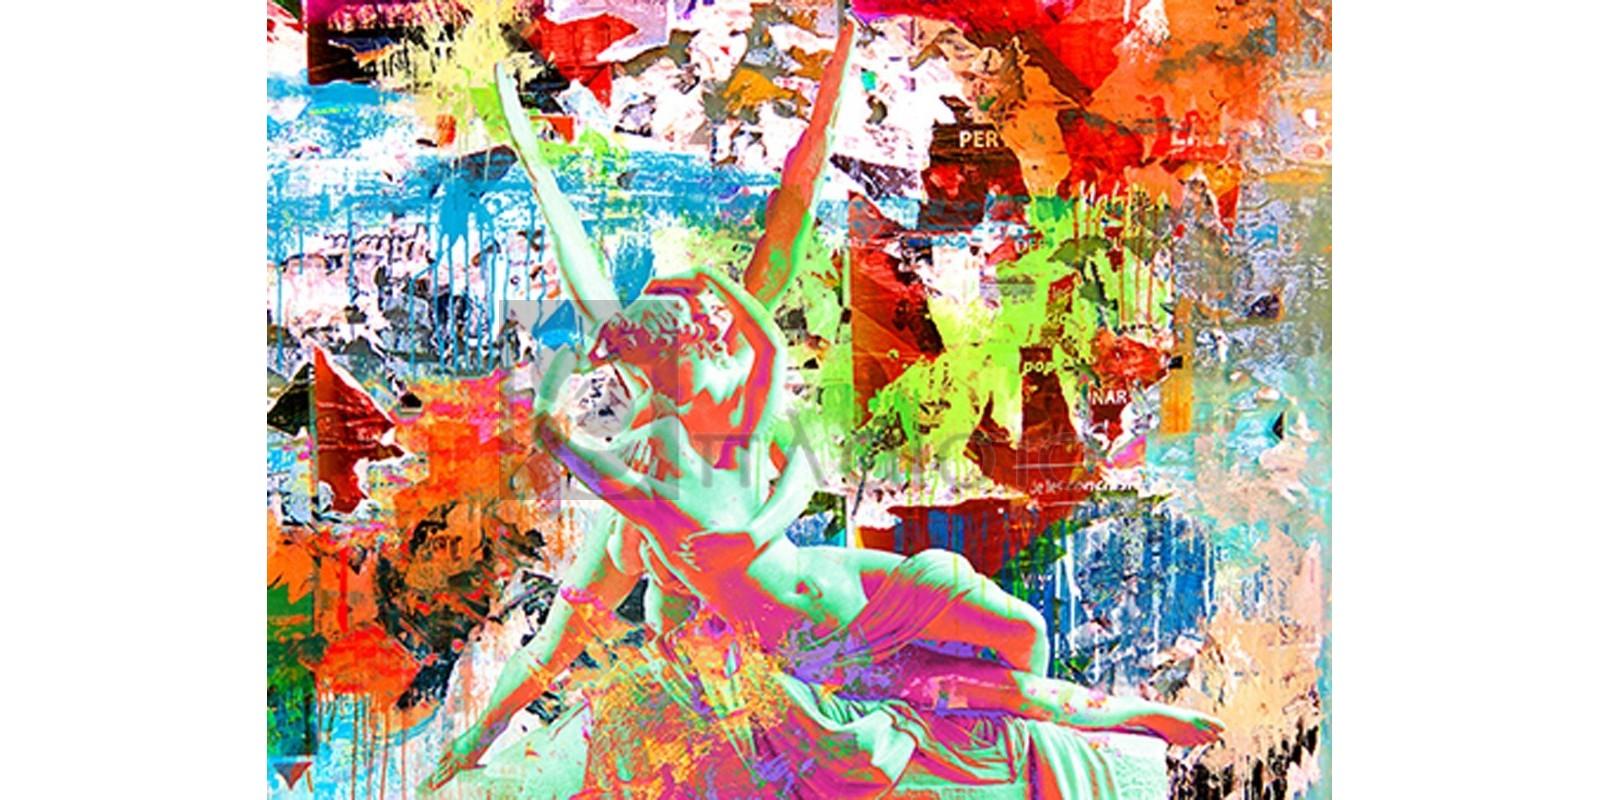 Eric Chestier - Cupid & Psyche